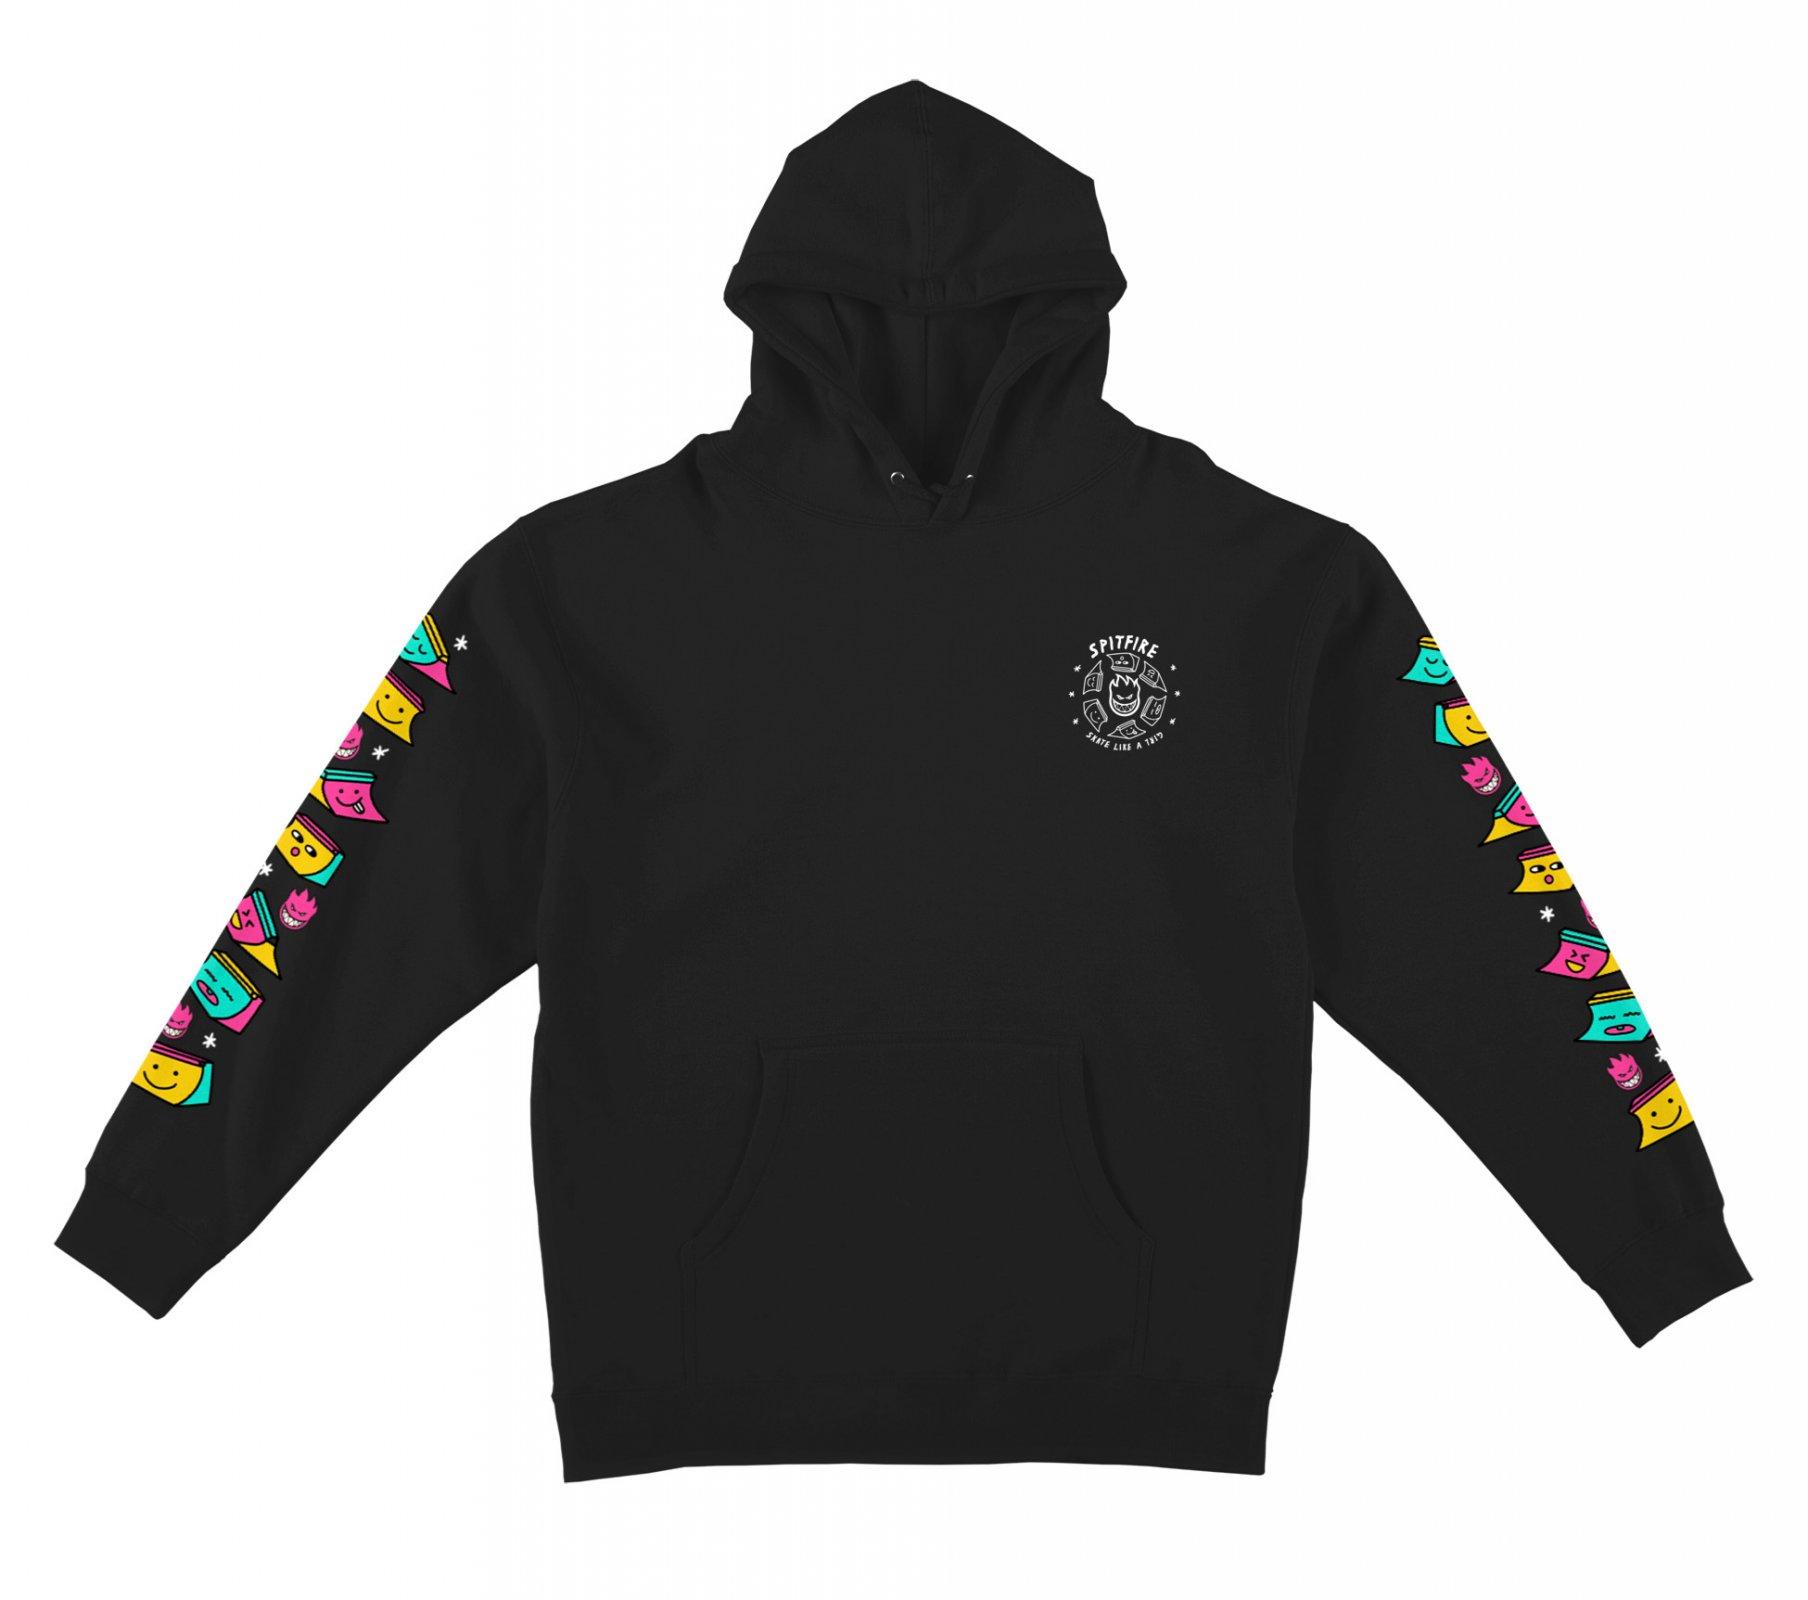 Spitfire Skate Like A girl Sleeve Hooded Sweatshirt black/multi